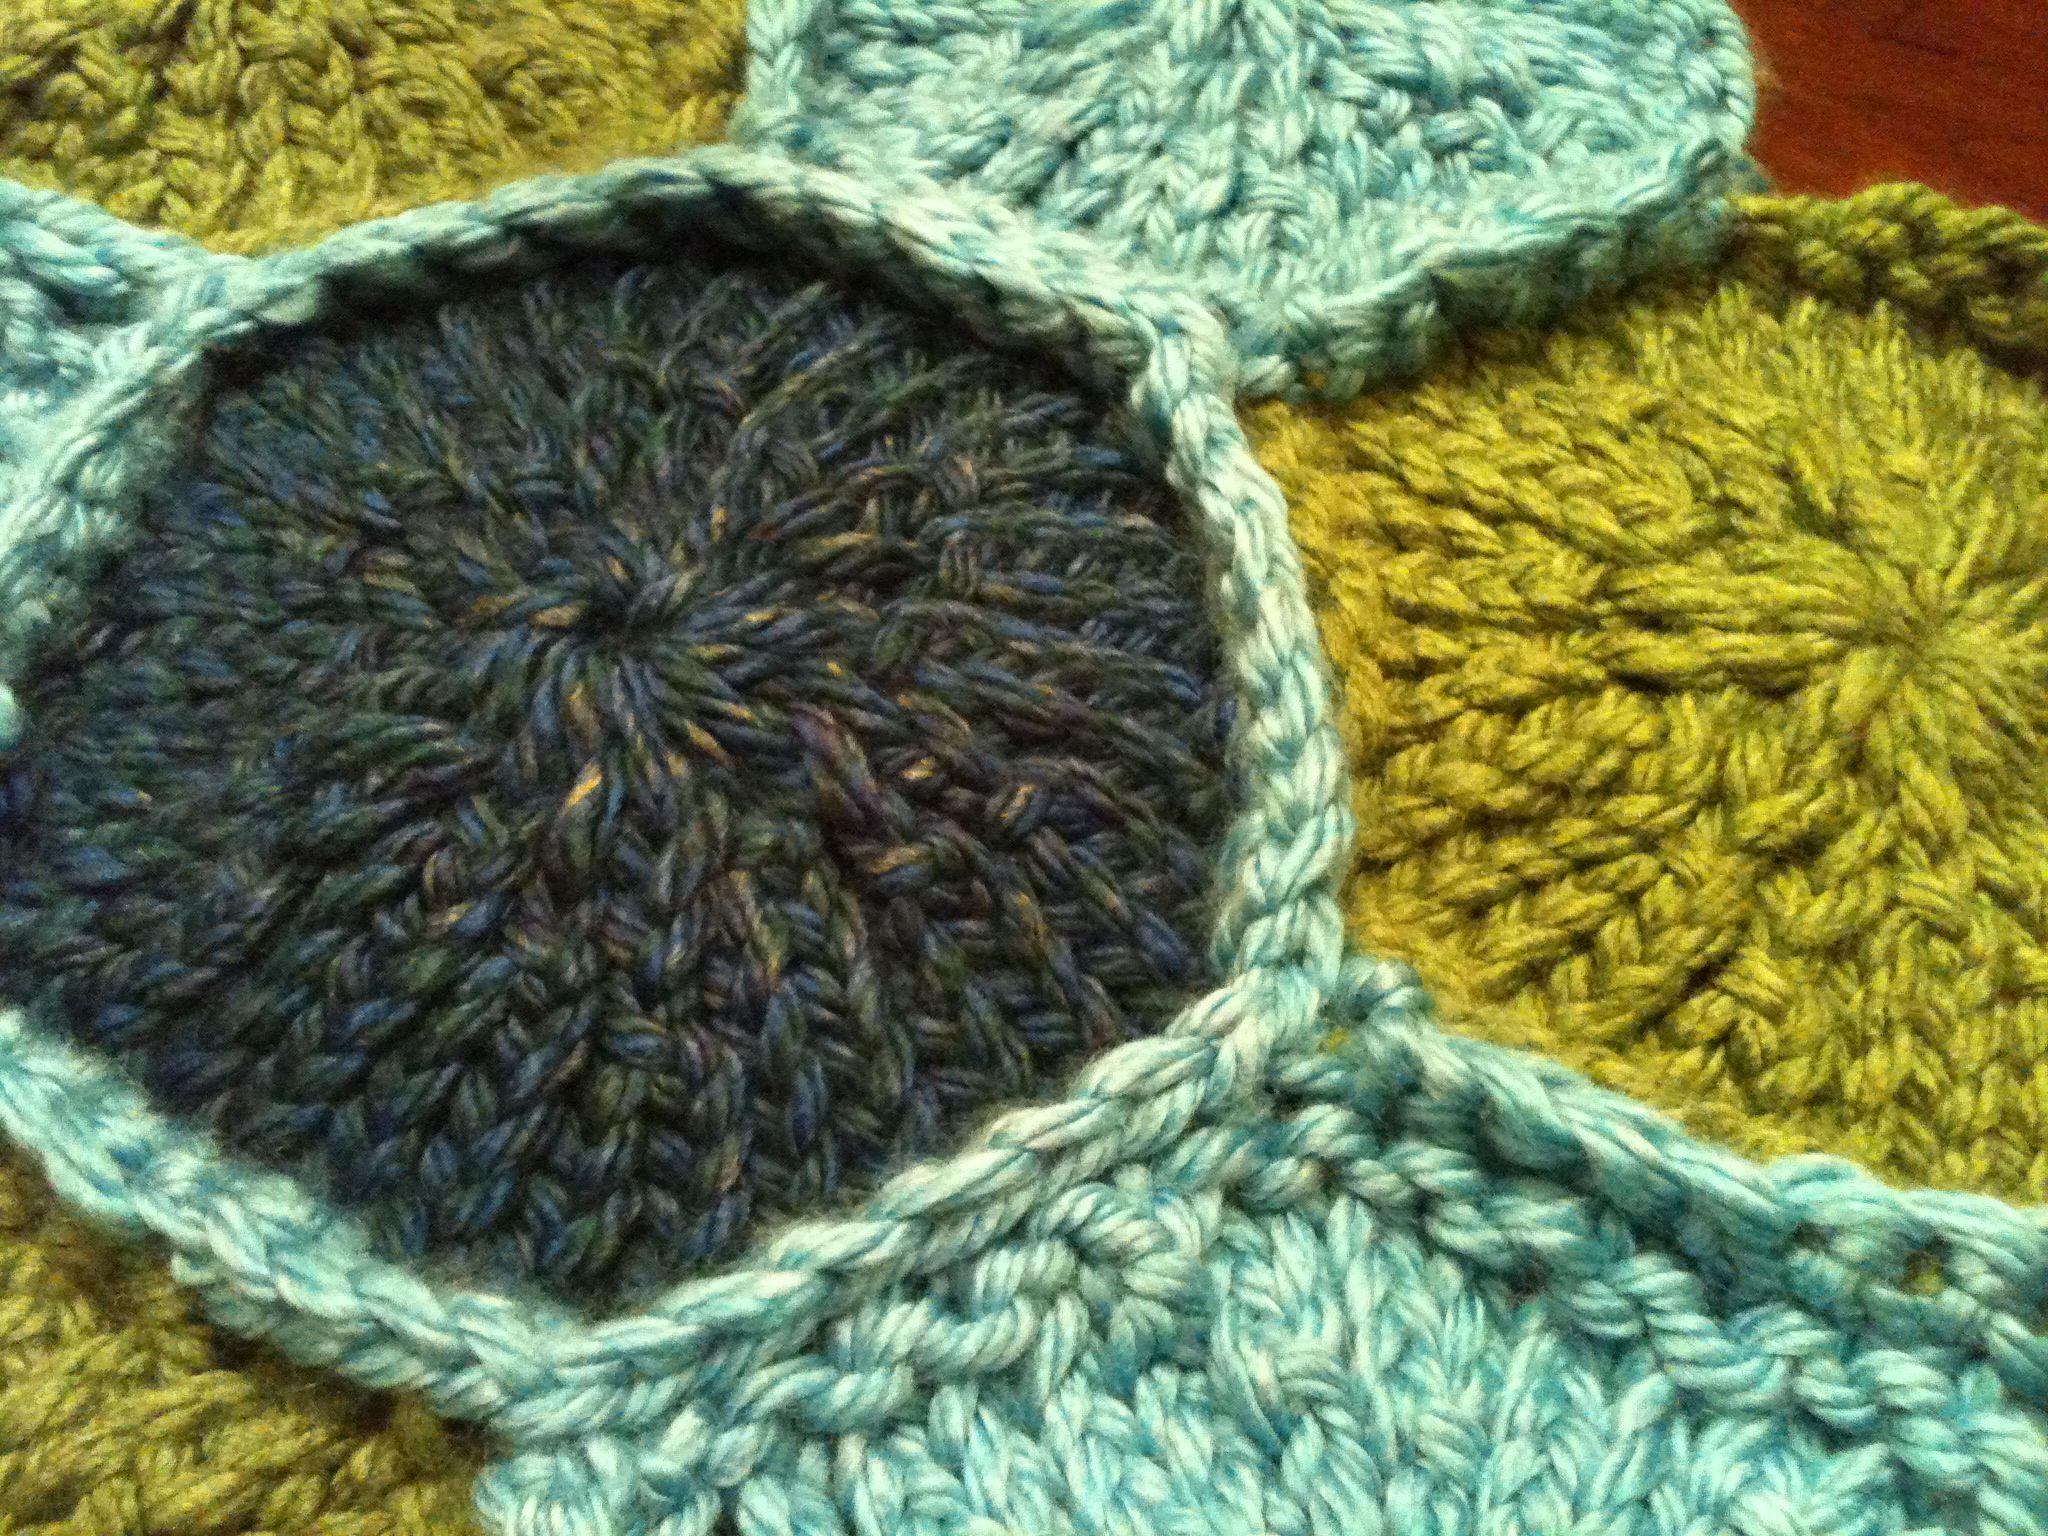 Loom knit - Create a Granny round on the 36 peg loom | knitting loom ...